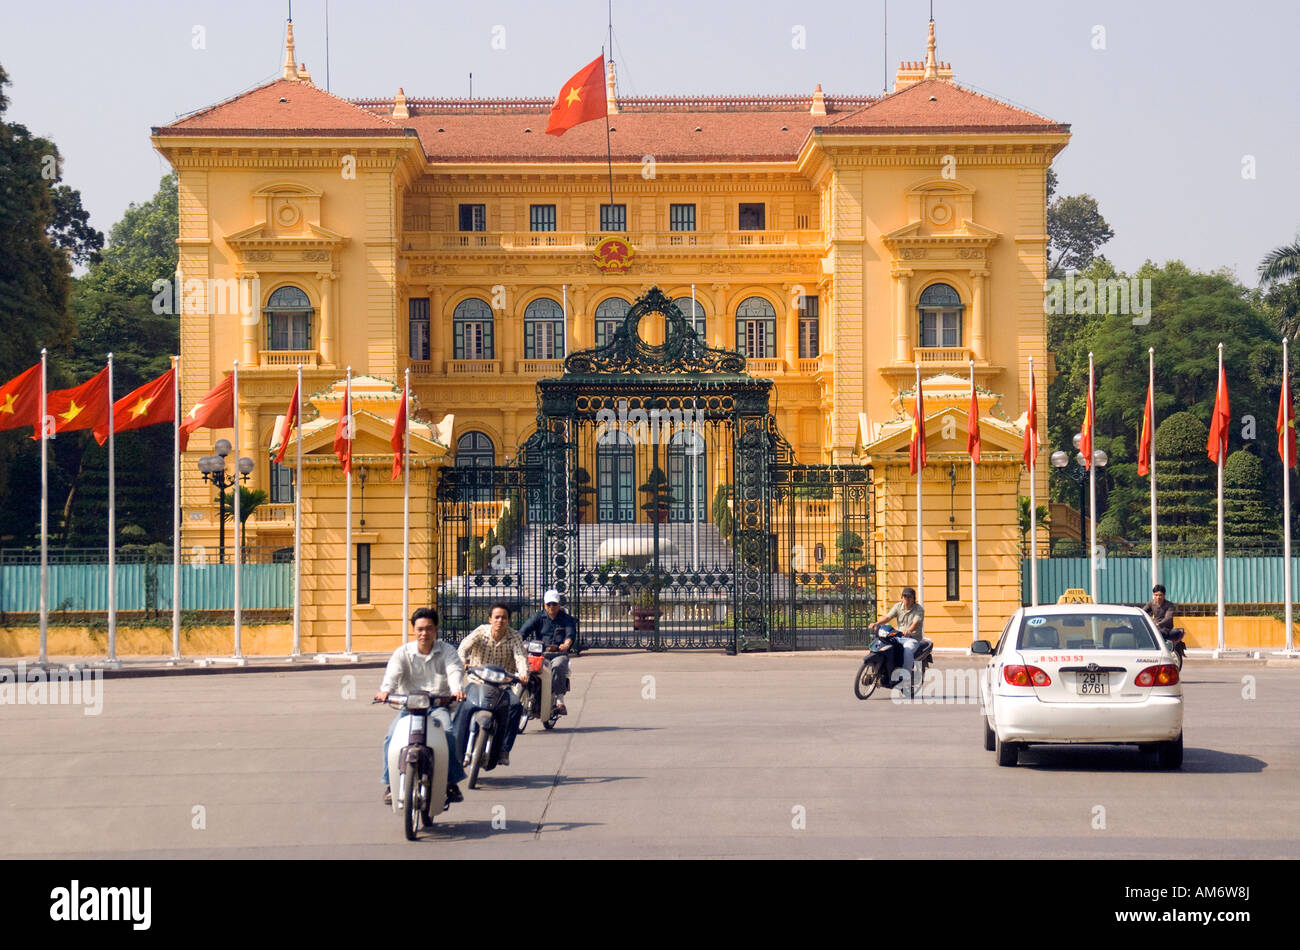 Vietnam Presidential Palace in Hanoi - Stock Image